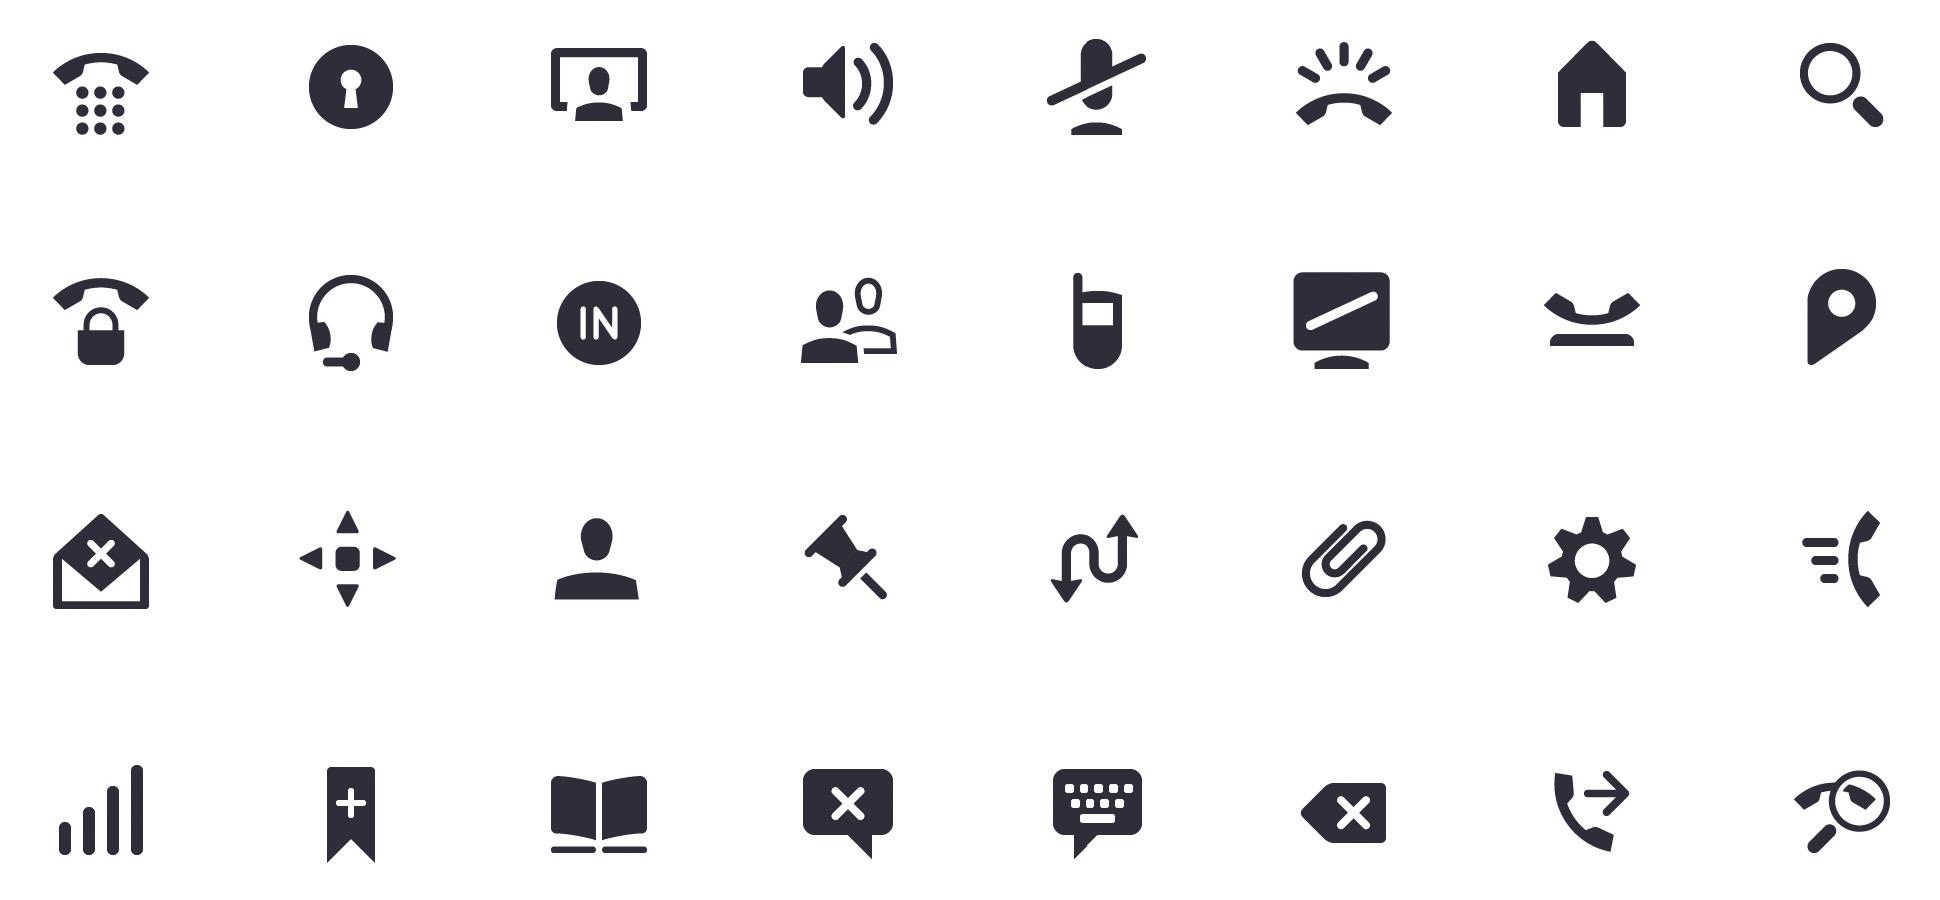 8 Cisco Phone Icons Images